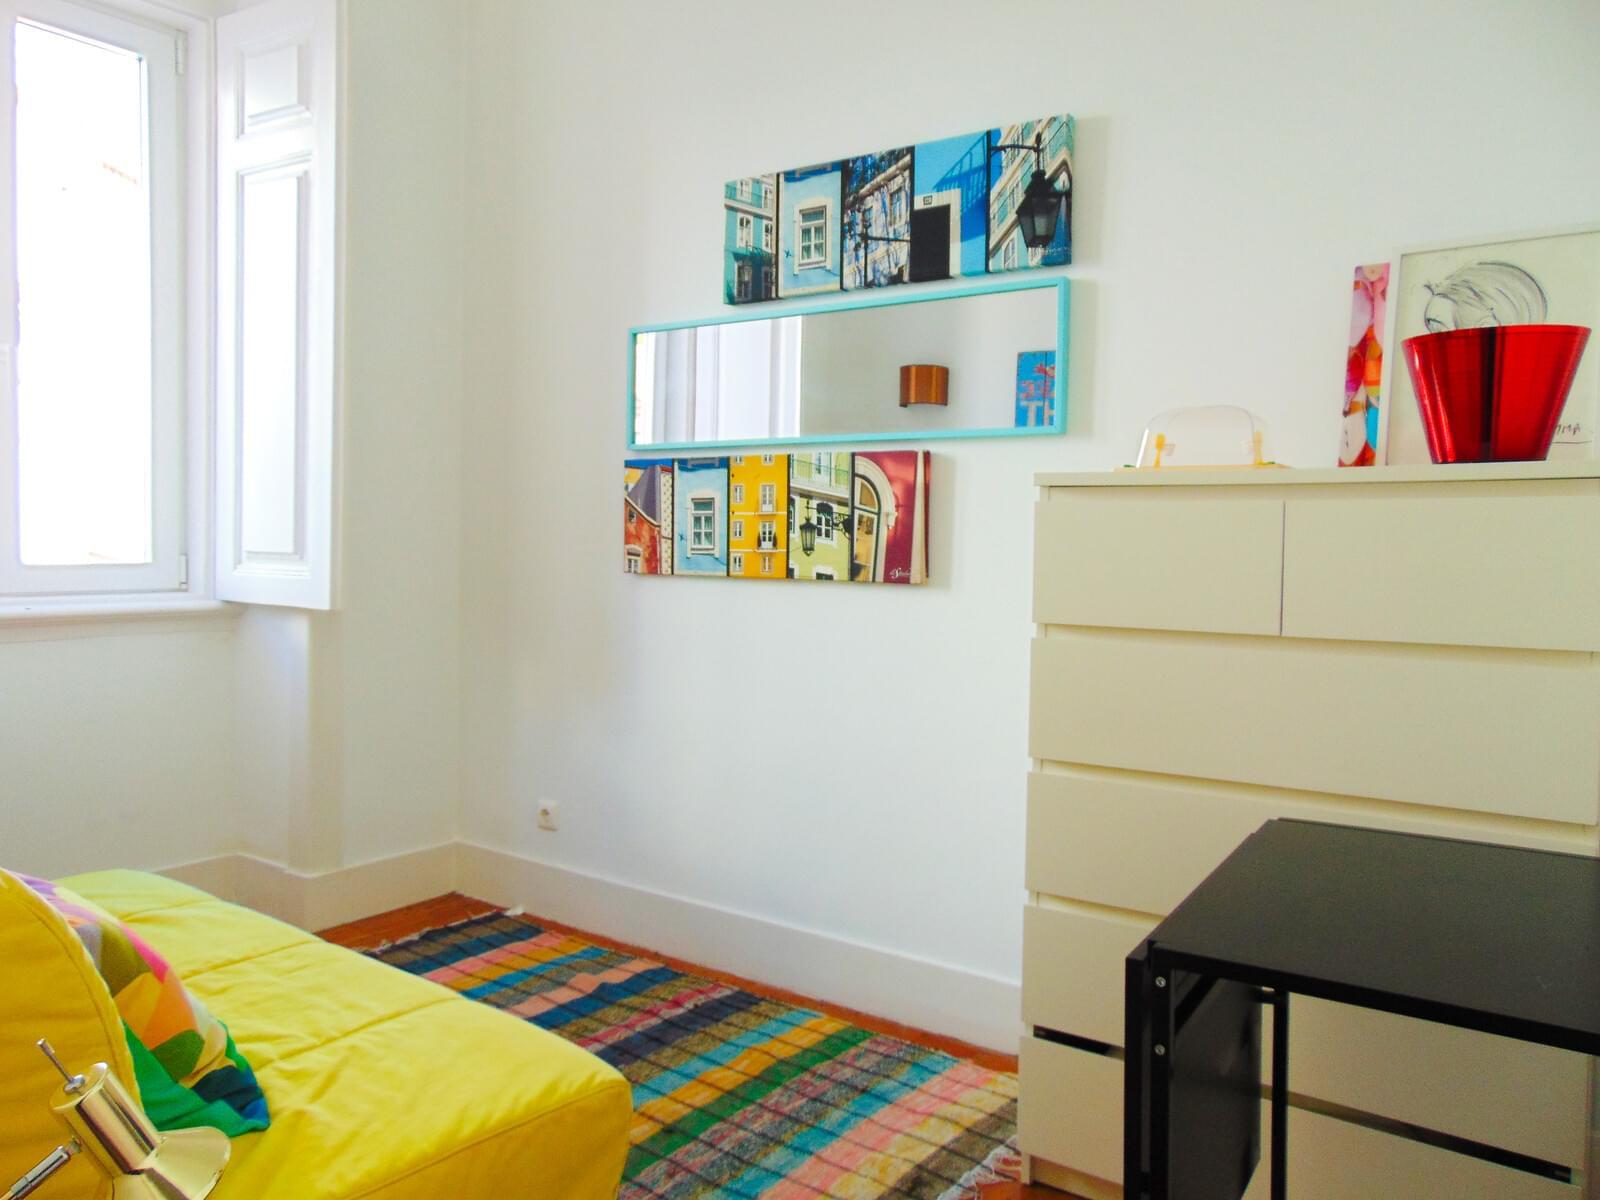 pf18269-apartamento-t1-lisboa-f0ad90f9-1ade-4f91-9f9e-9b37284acb48